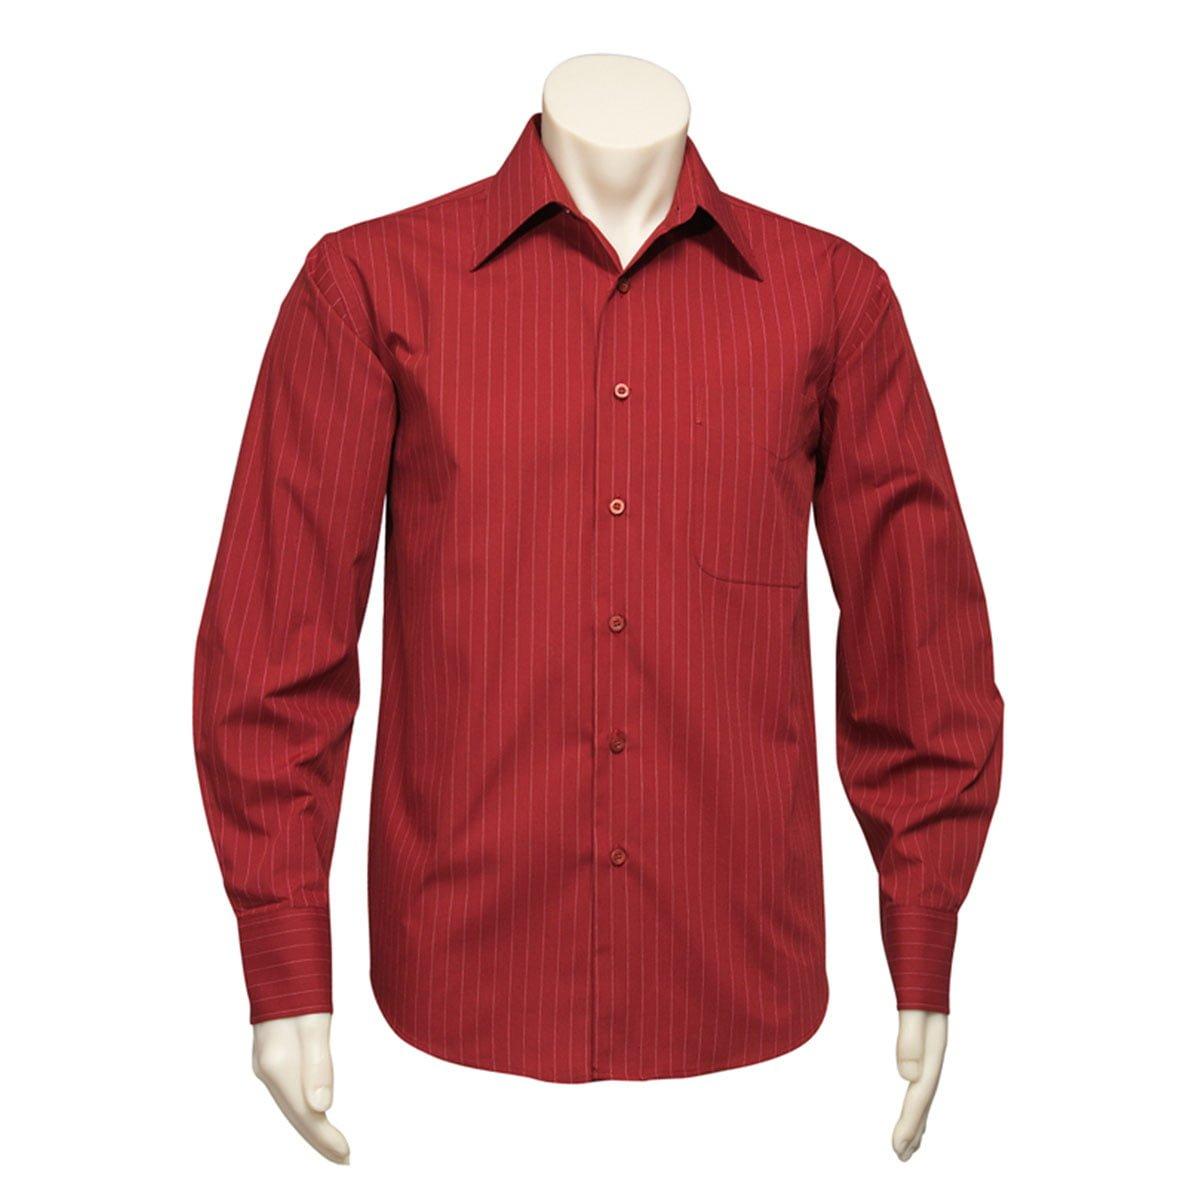 Mens Manhattan Long Sleeve Shirt-Cherry / White